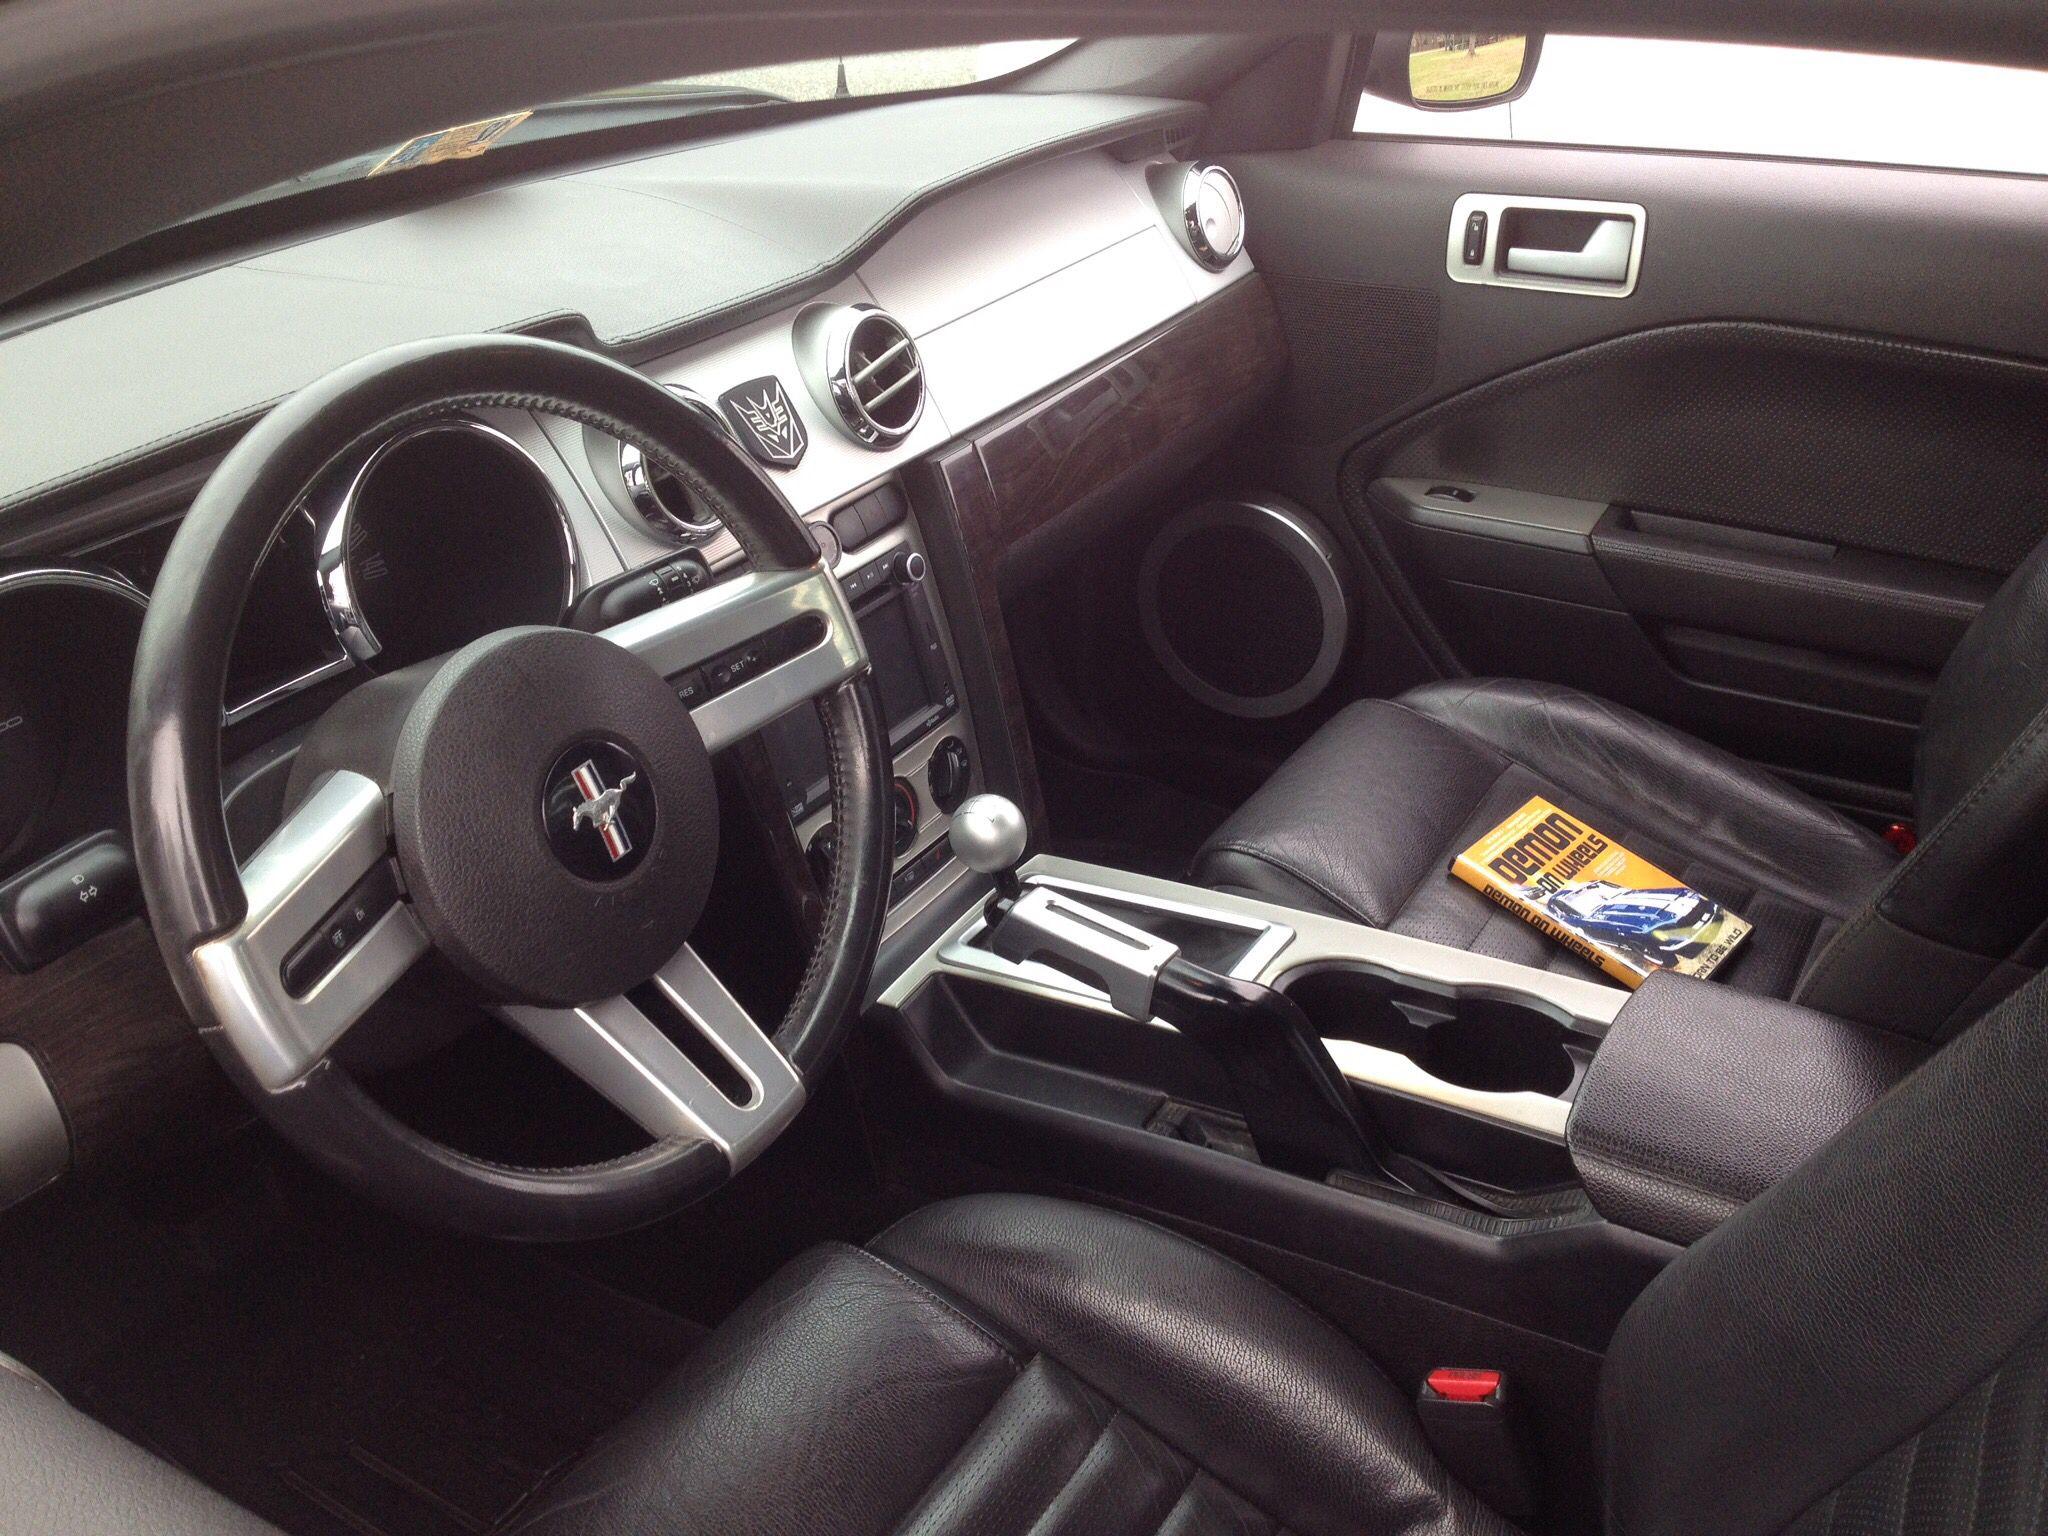 16 Mustang Gt Cabin Ideas 2007 Mustang Gt 2016 Mustang Gt Mustang